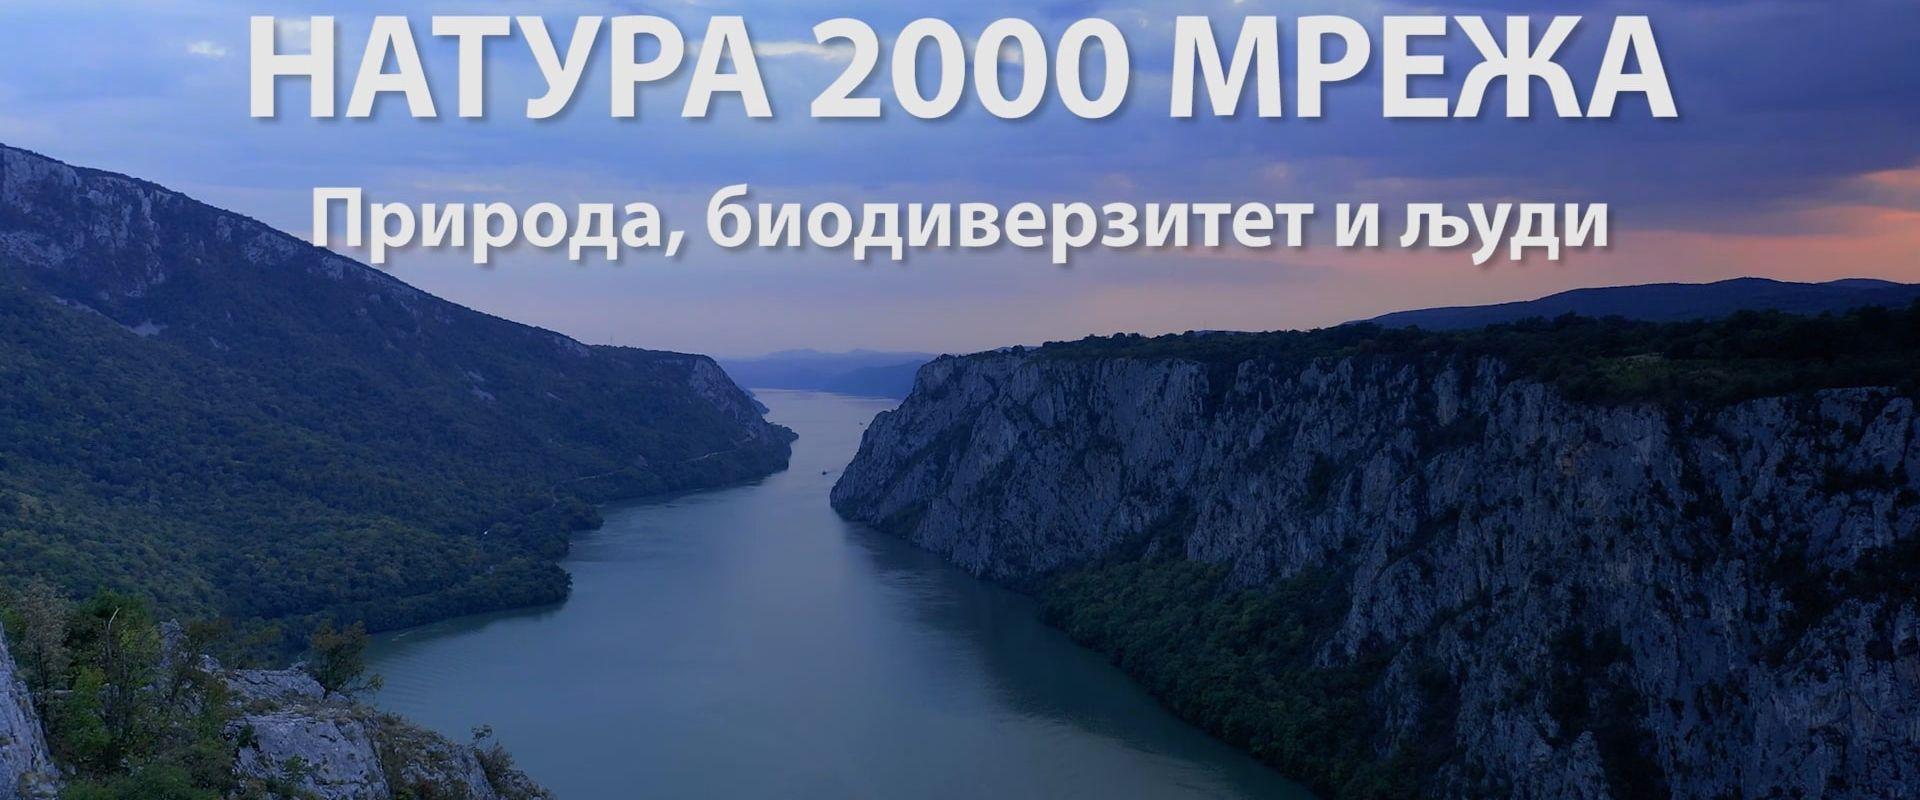 Natura 2000 movie